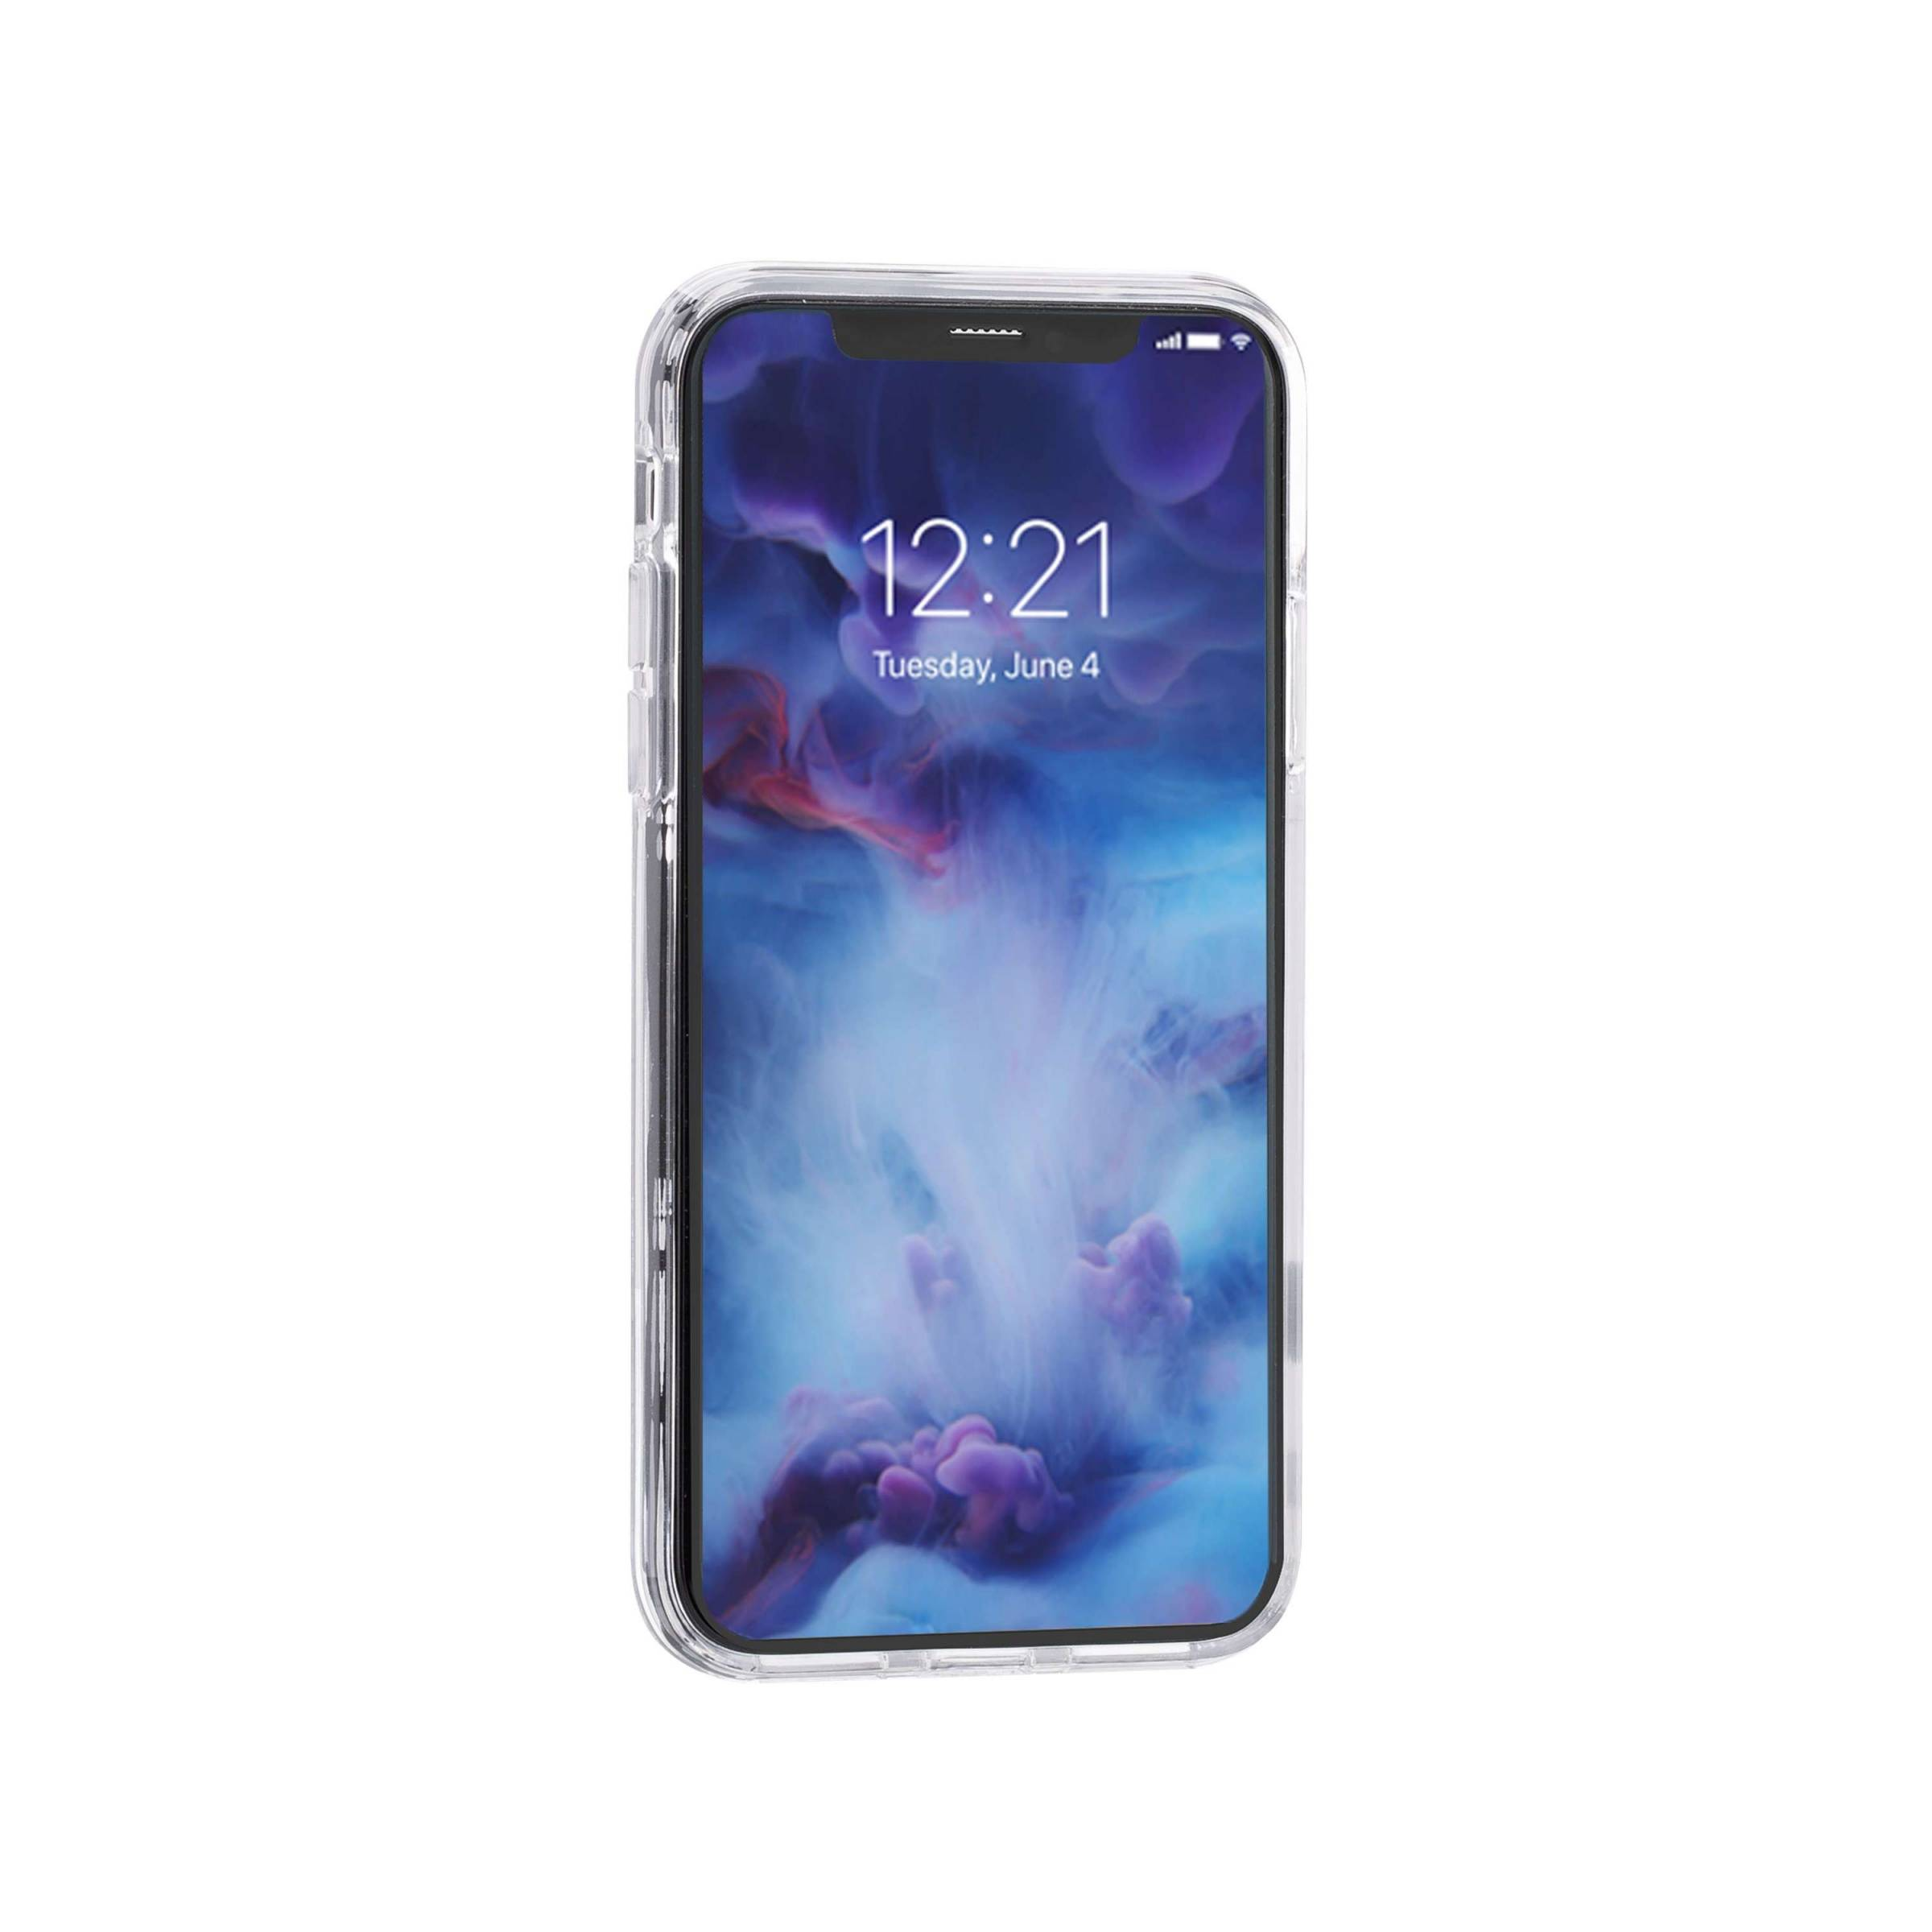 Bilde av 3sixt Iphone 11 Pro Max Pure Flex 2.0 Case